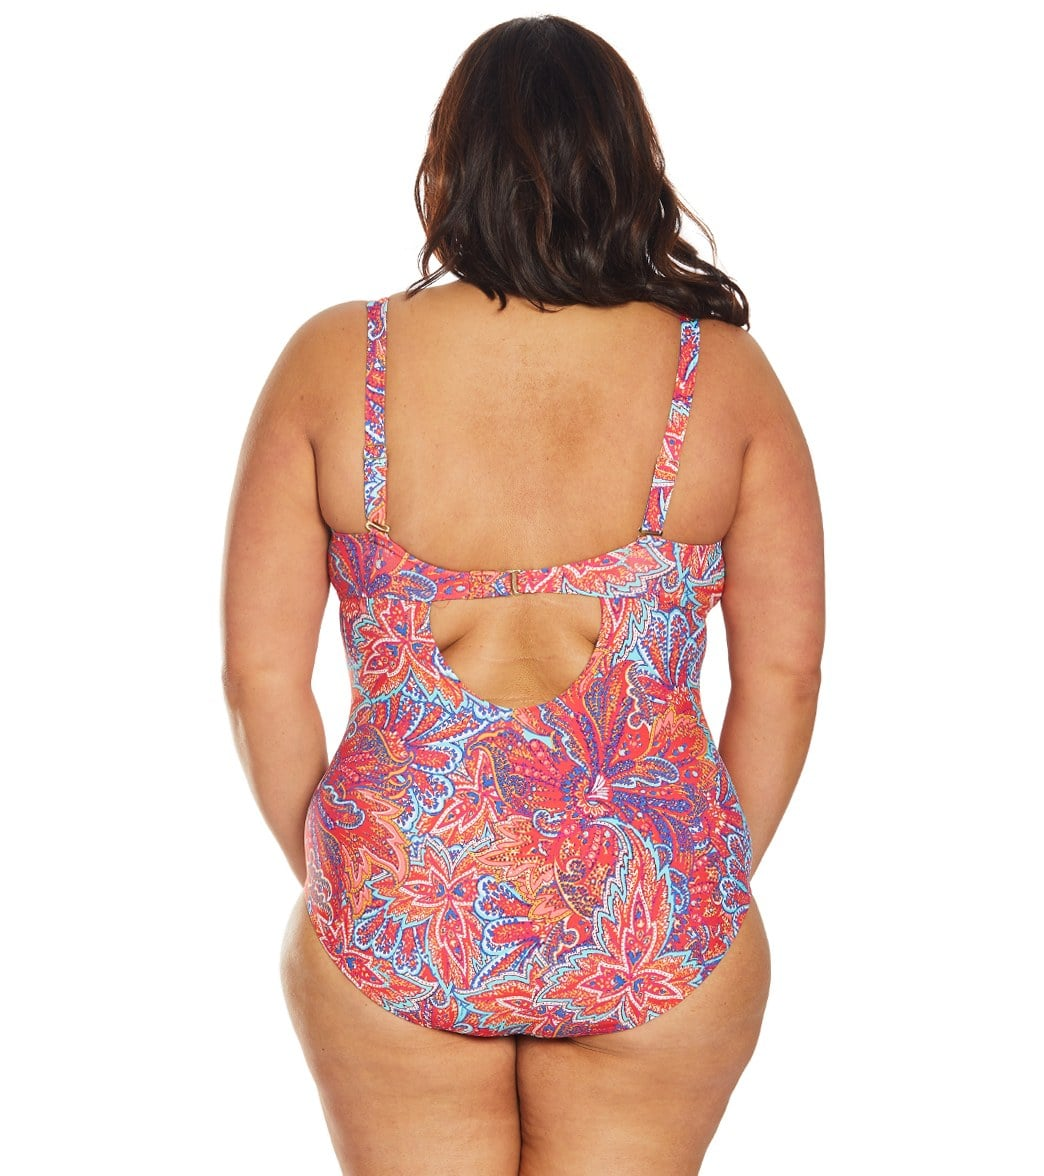 44bce7e91f Sunsets Curve Plus Size Samba Sasha Crossover One Piece Swimsuit at  SwimOutlet.com - Free Shipping